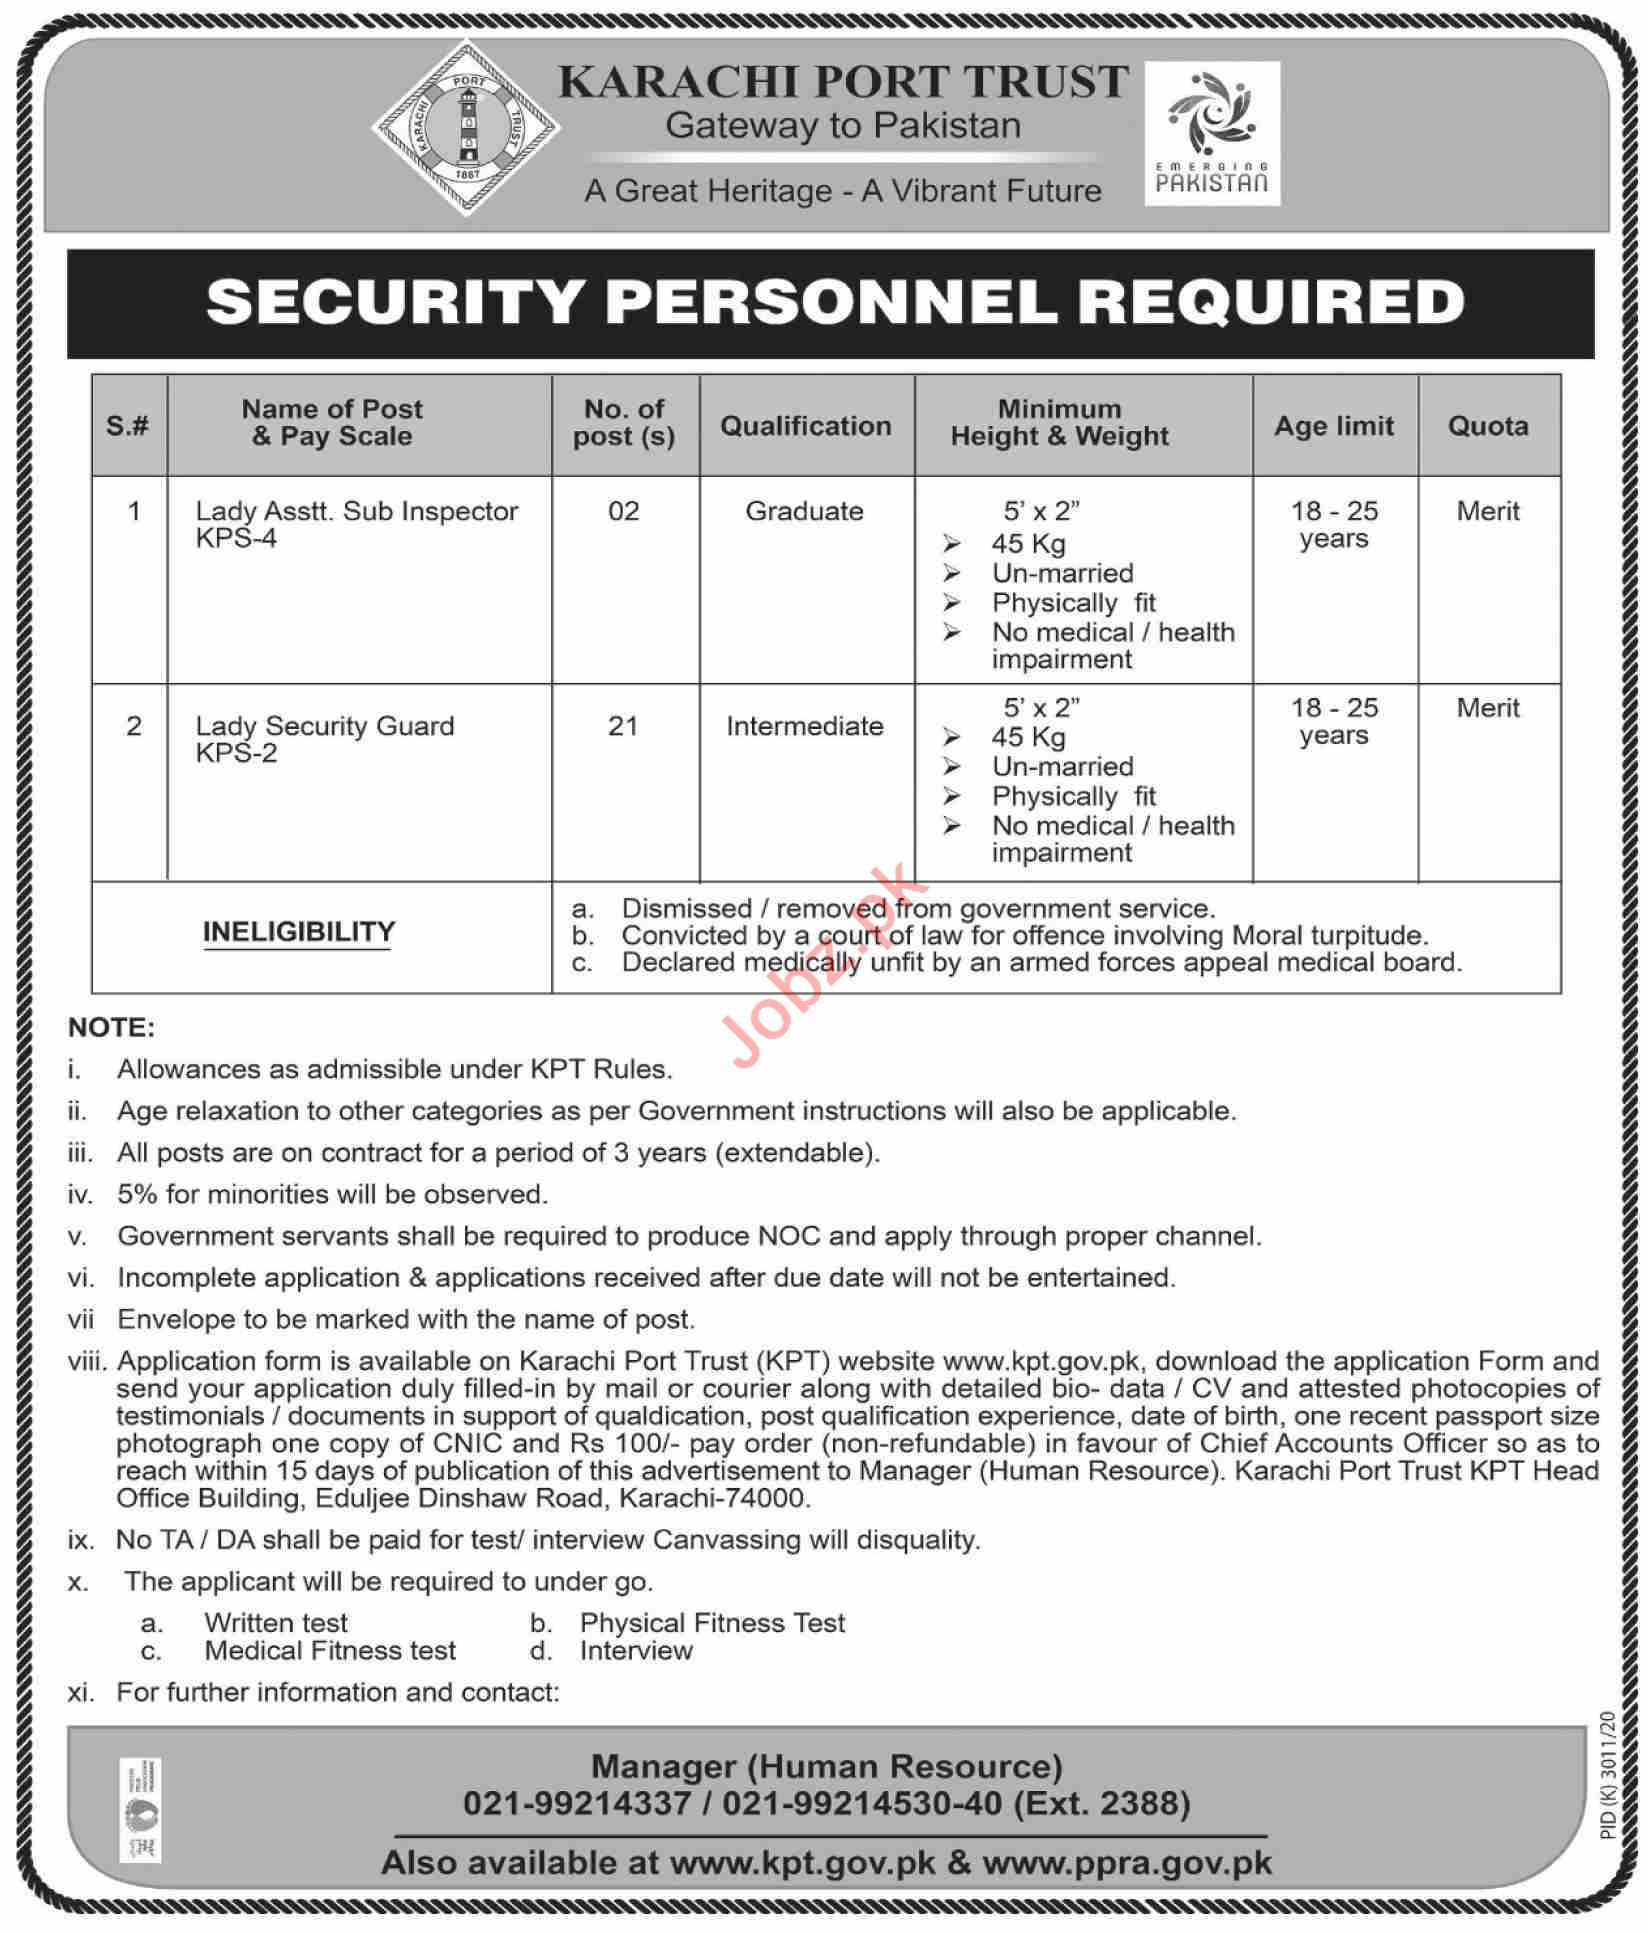 Karachi Port Trust KPT Jobs 2021 for Security Professionals